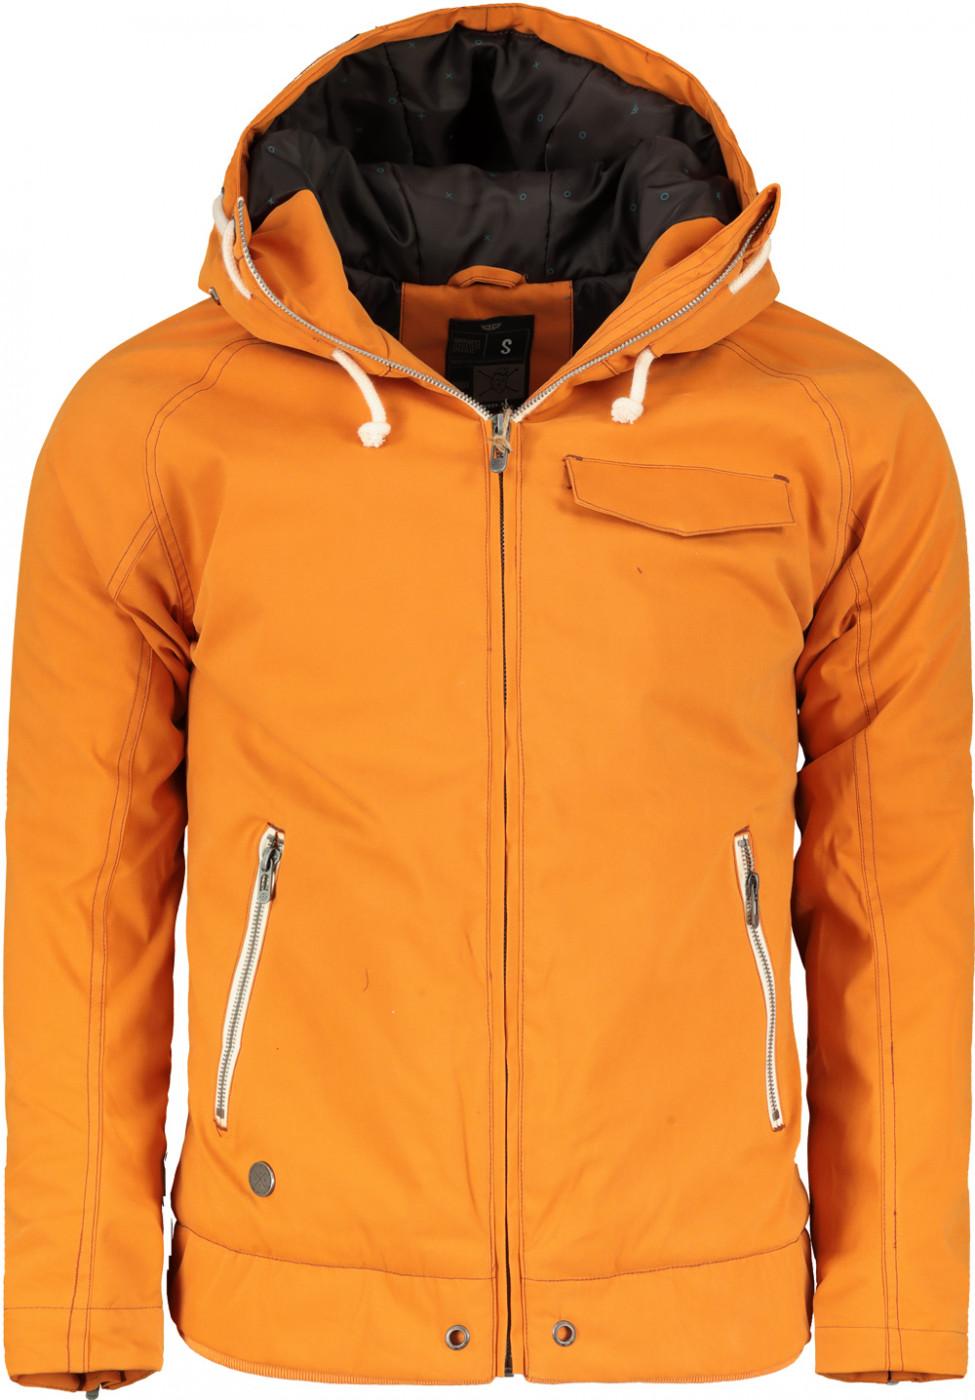 Men's Winter jacket WOOX Pinna